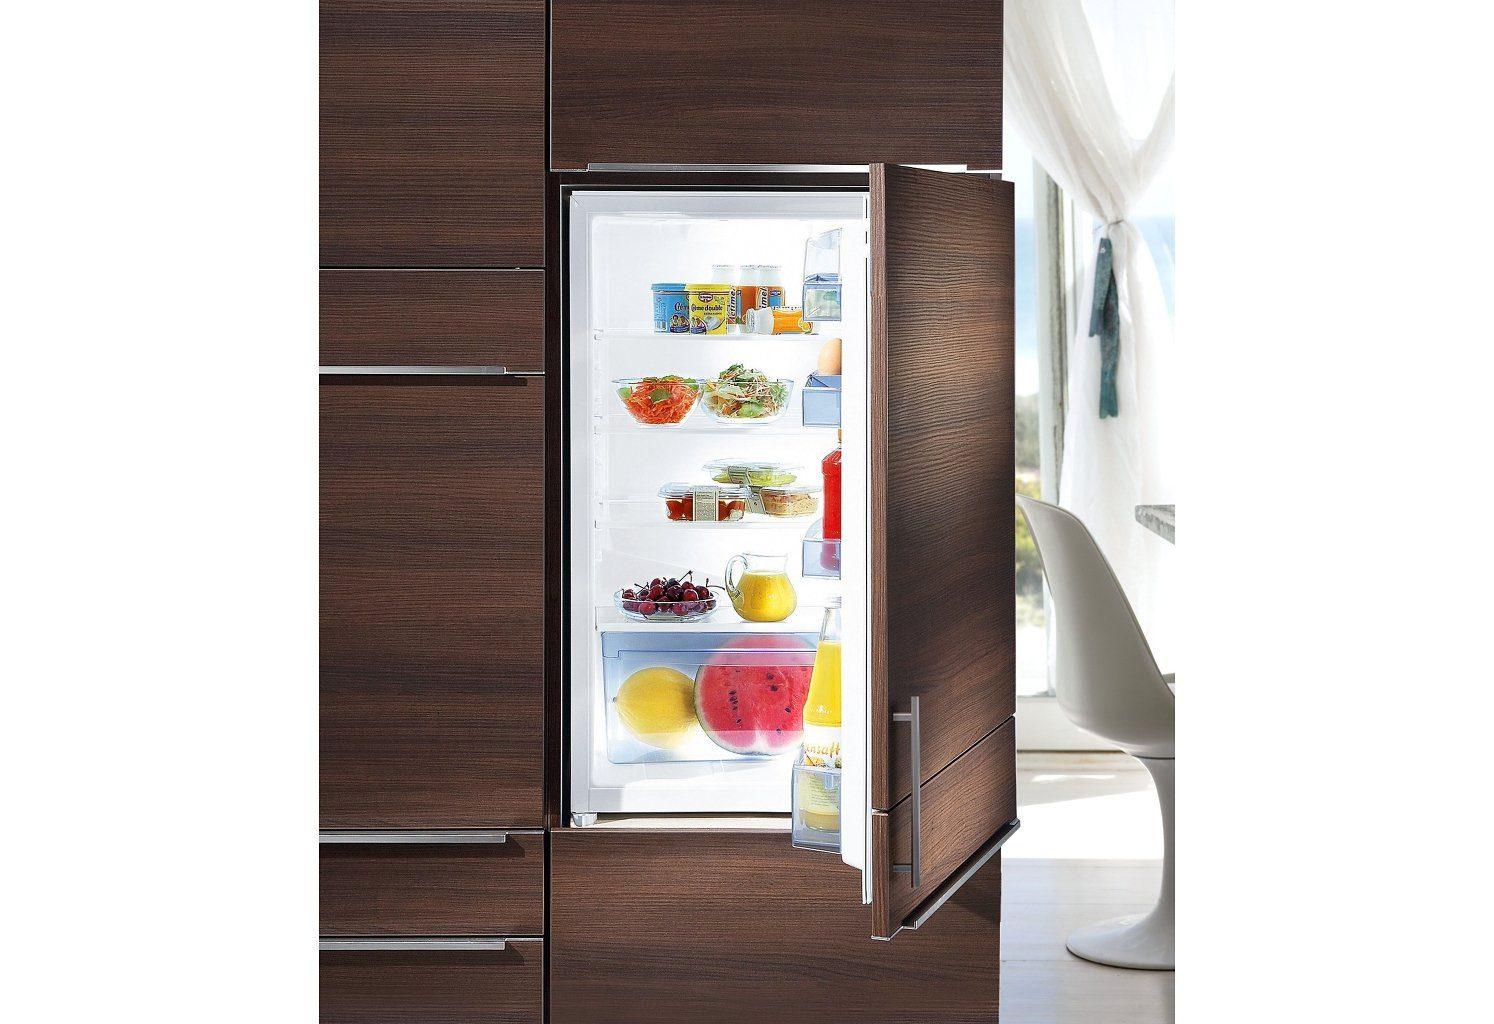 Gorenje Kühlschrank Hi1526 : Gorenje einbaukühlschrank ri aw cm hoch cm breit